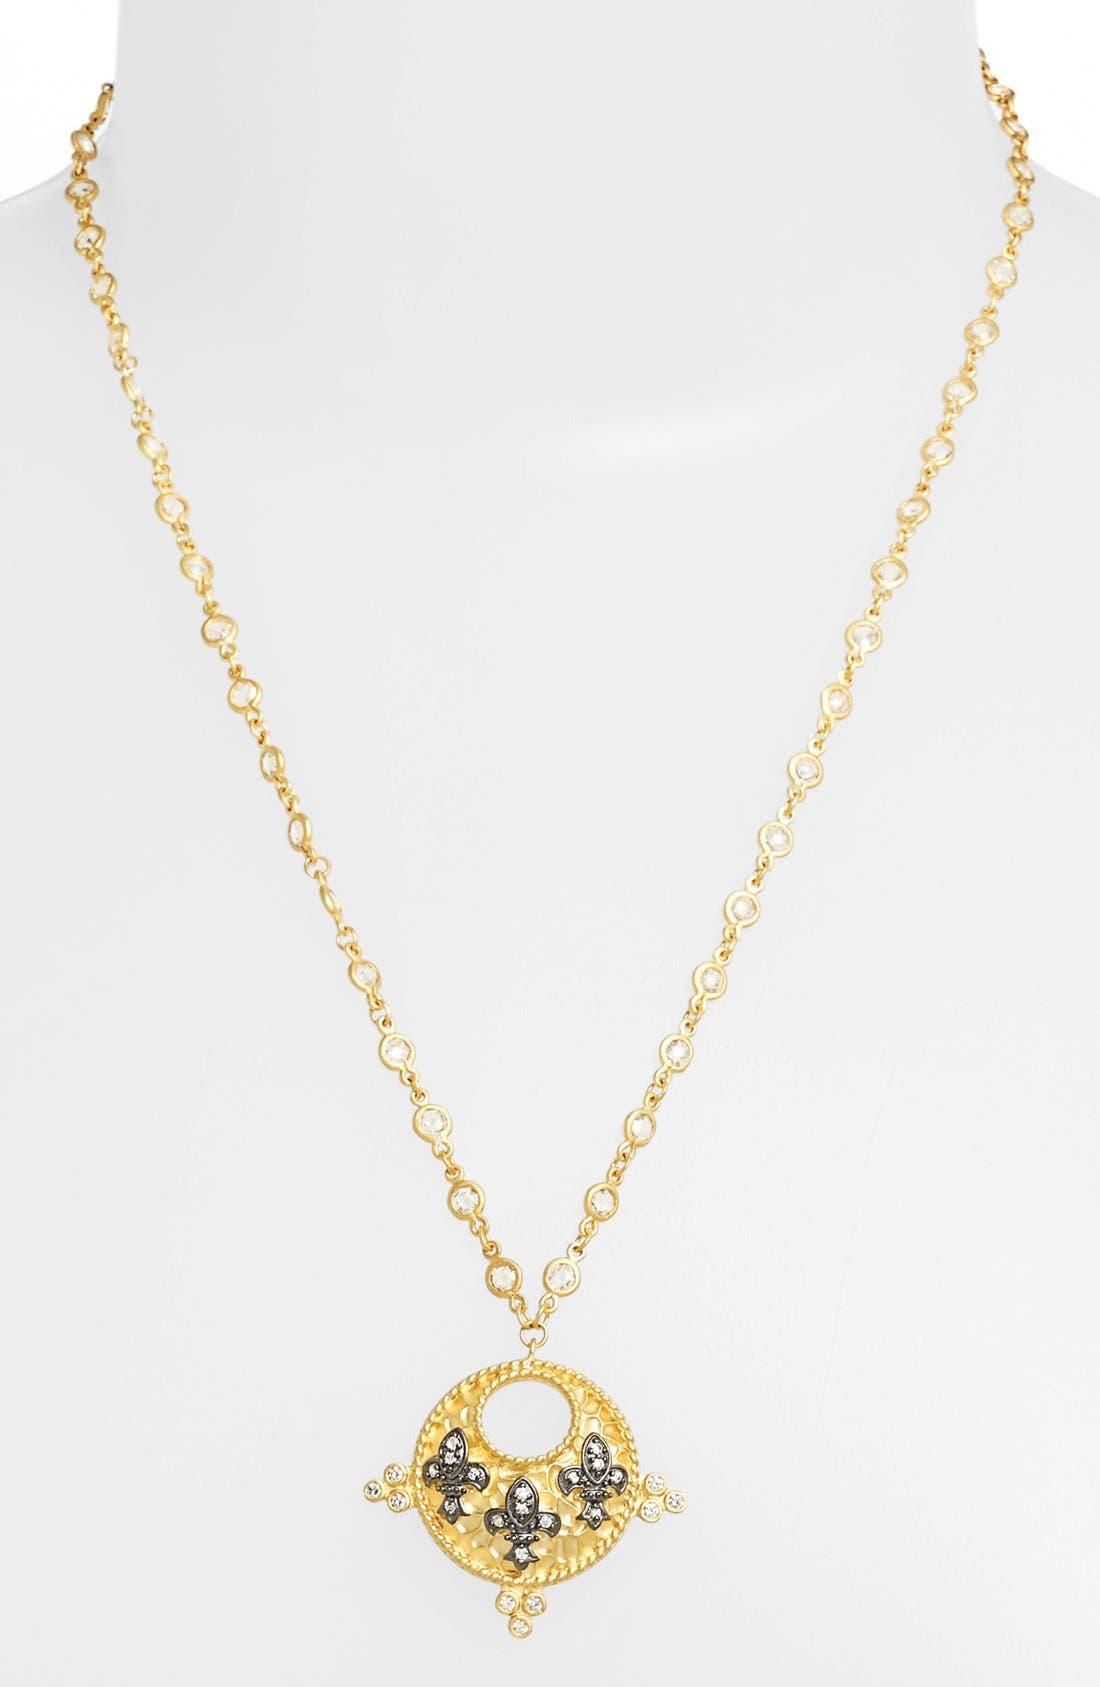 Alternate Image 1 Selected - FREIDA ROTHMAN 'Tribeca' Triple Fleur de Lis Pendant Necklace (Online Only)